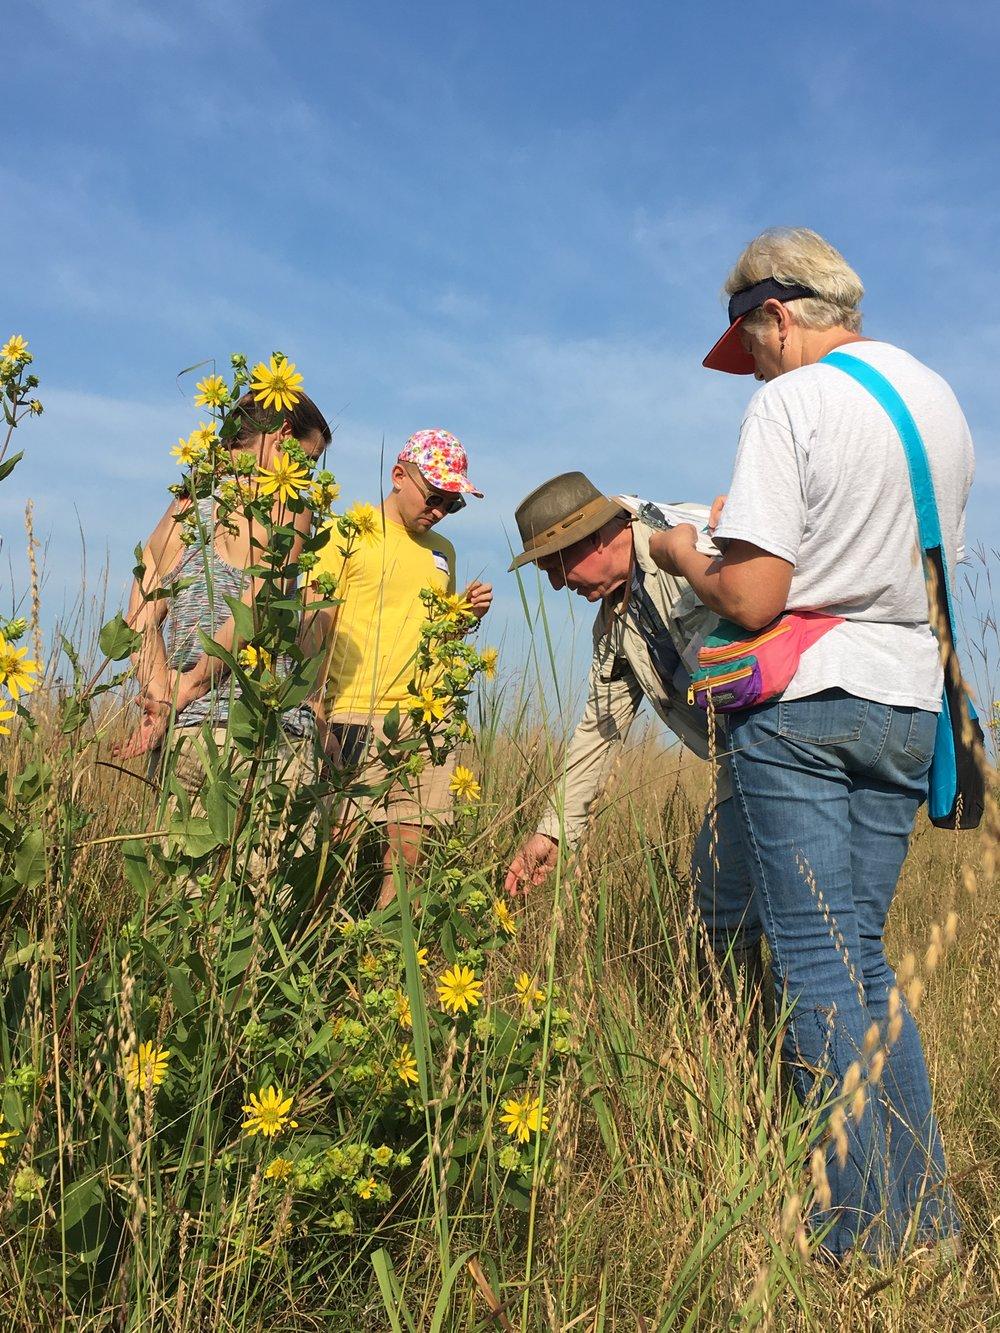 TWI Senior Ecologist Gary Sullivan led a wildflower walk along the Marquis Oak Ridge Trail. Photo by Pat Hollingsworth.